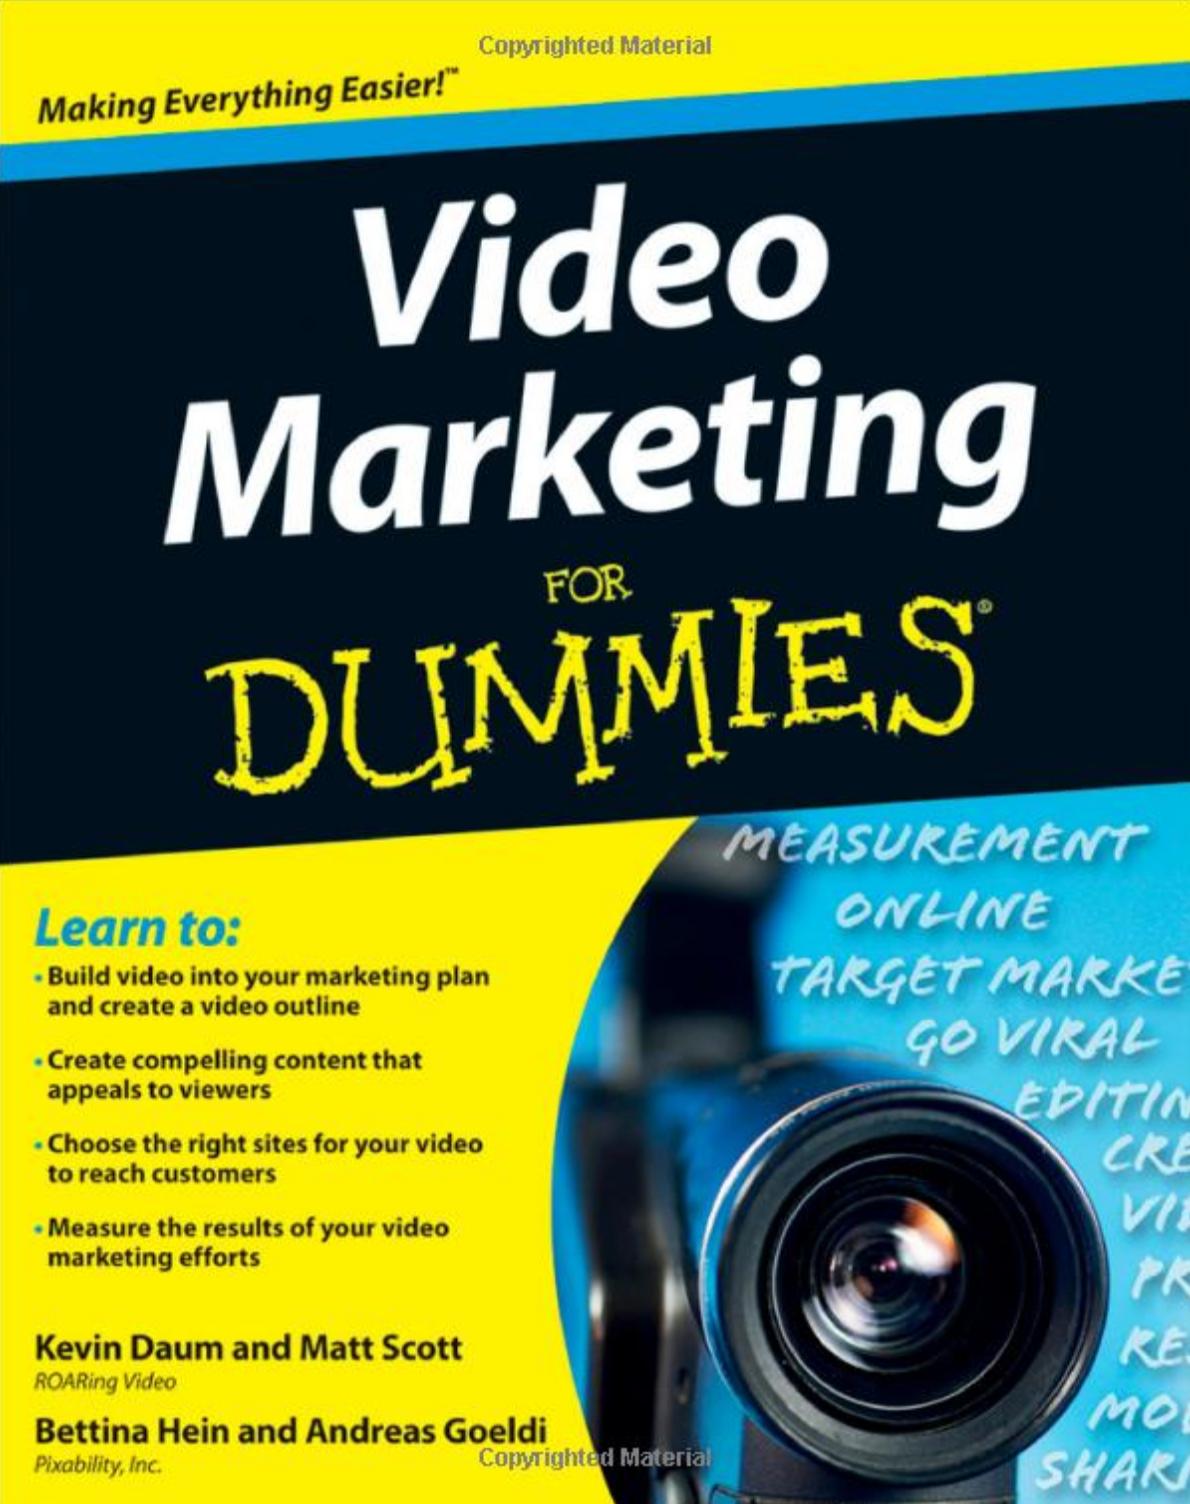 Video Marketing for Dummies - Kevin Daum